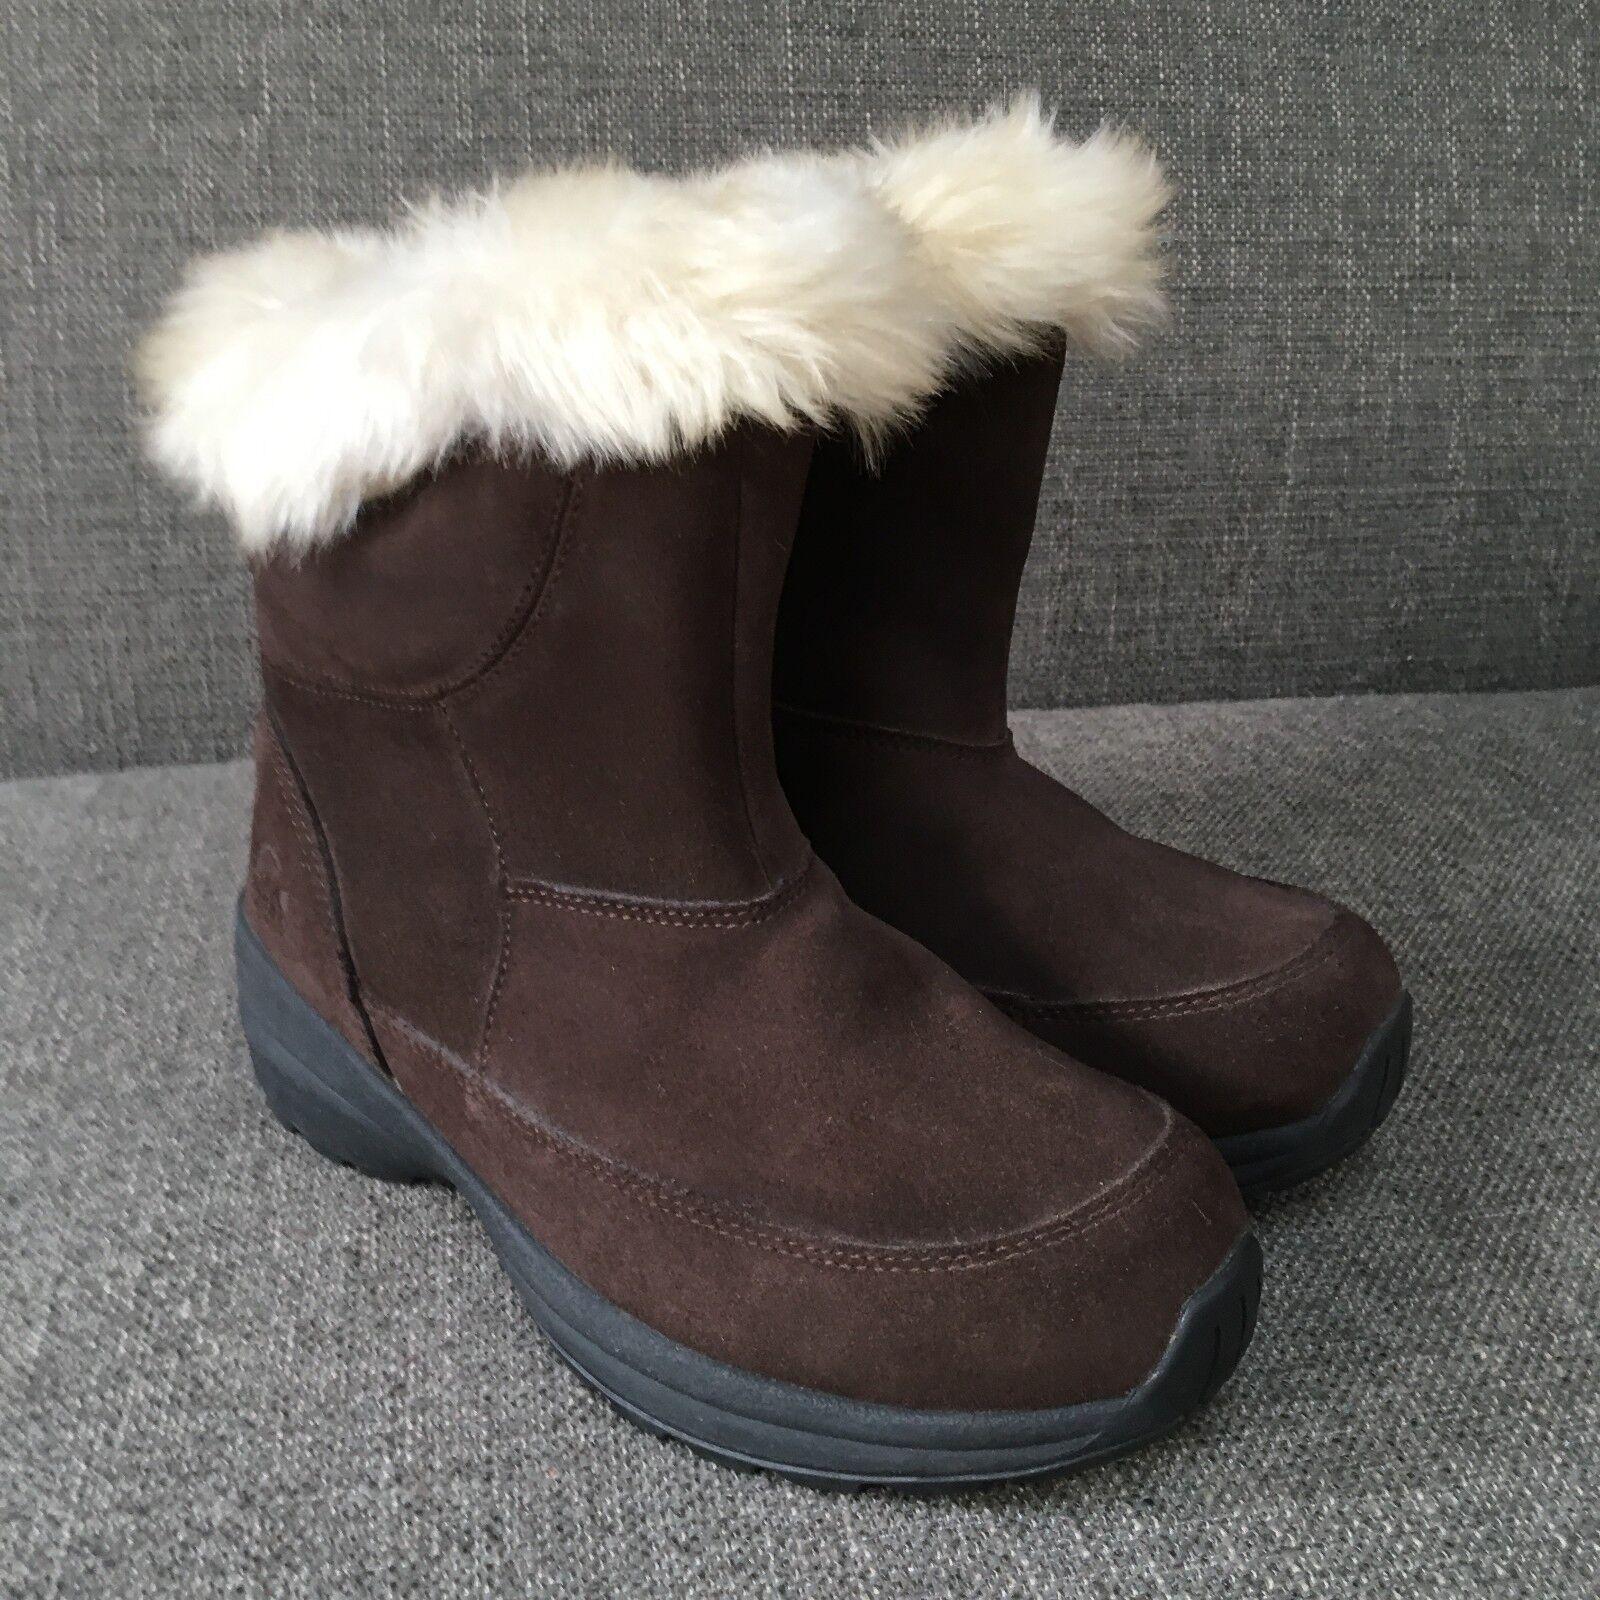 Sorel Damenschuhe Braun Suede Insulated Northern Lite Winter Boot Faux Fur Trim Zip 9